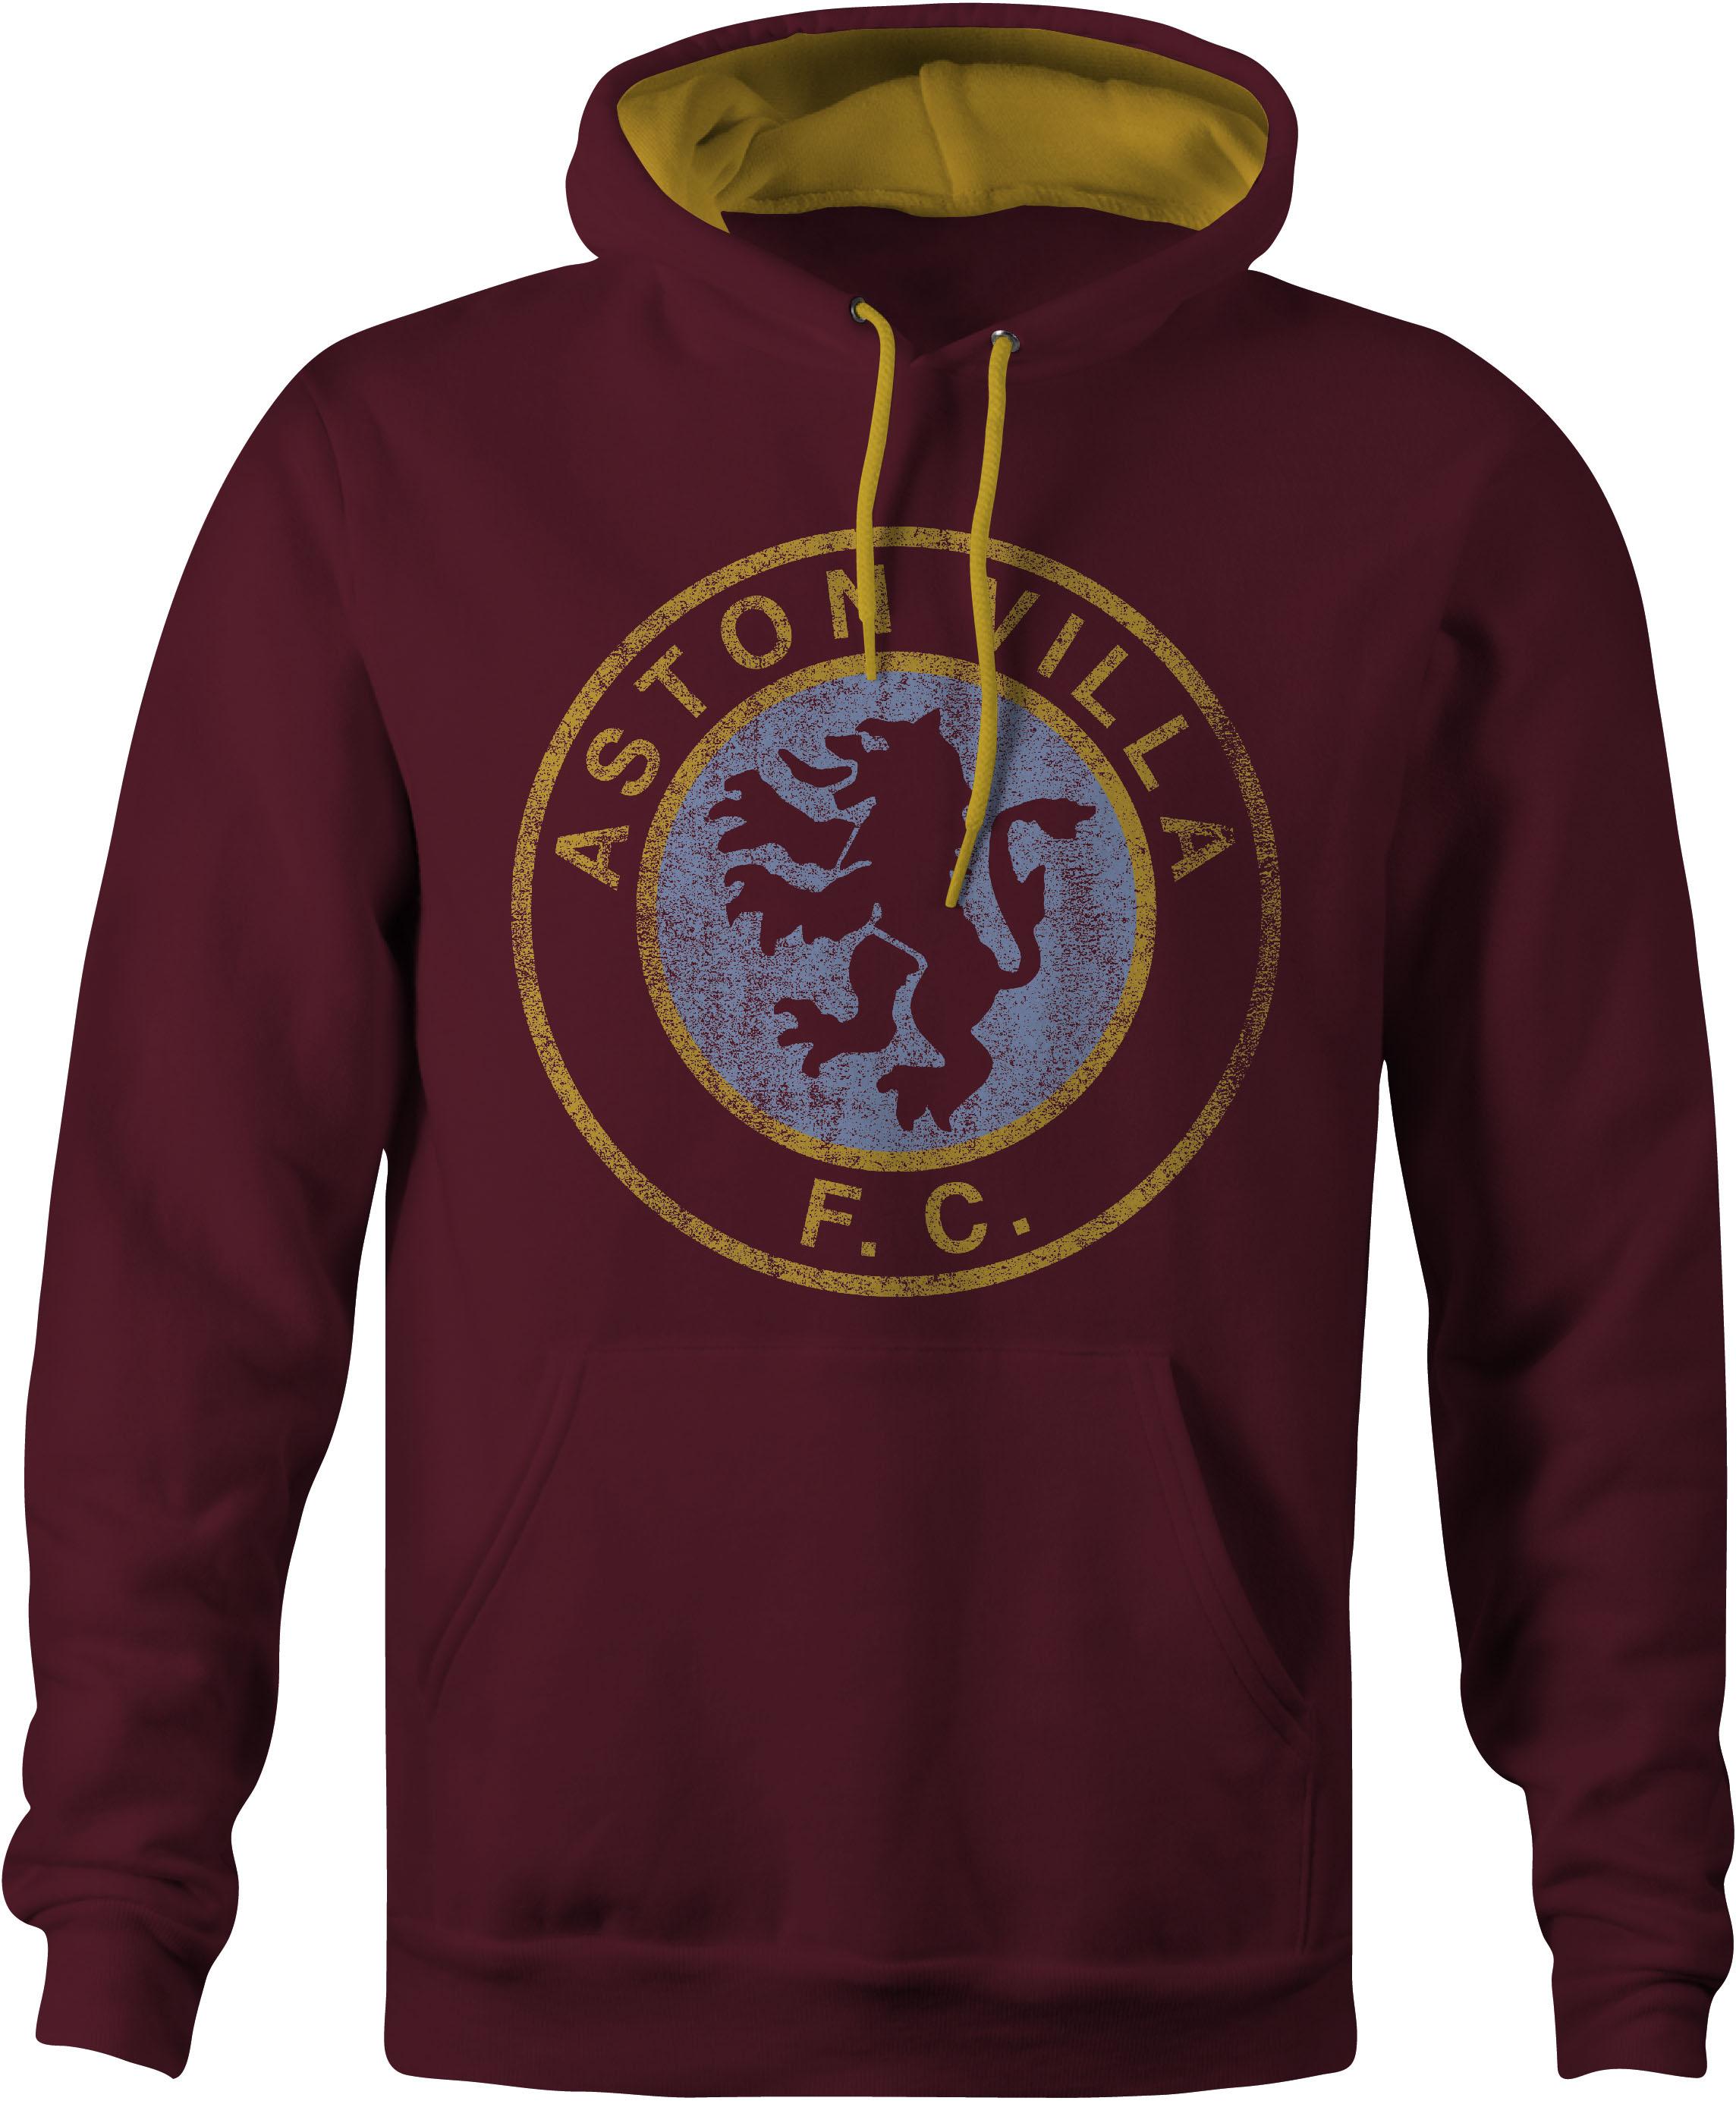 Aston Villa Varsity Conrast Hoody in Claret and Gold